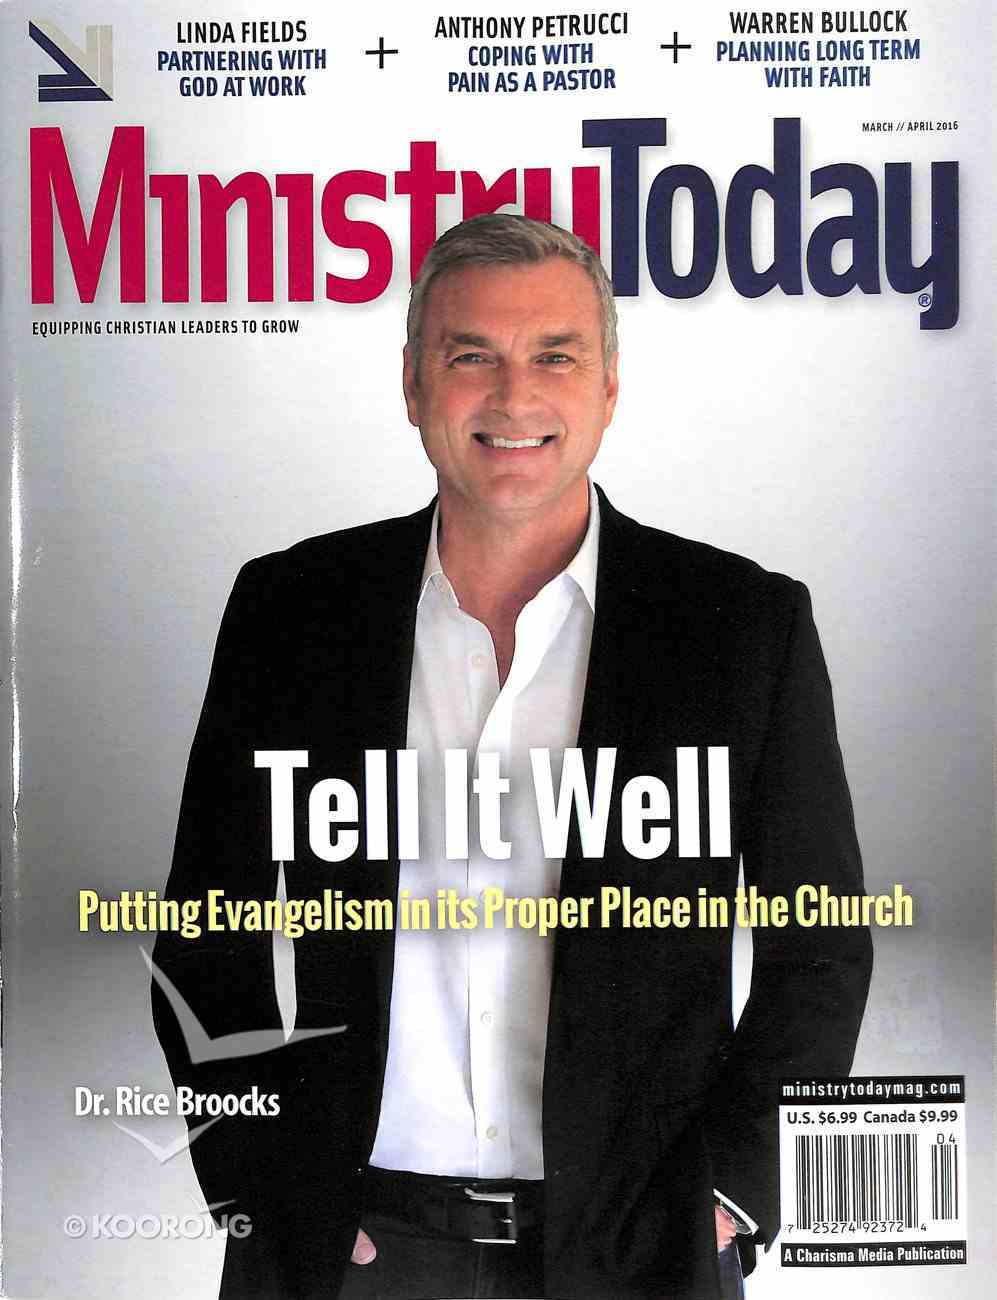 Ministry Today 2016 #02: Mar/Apr Magazine